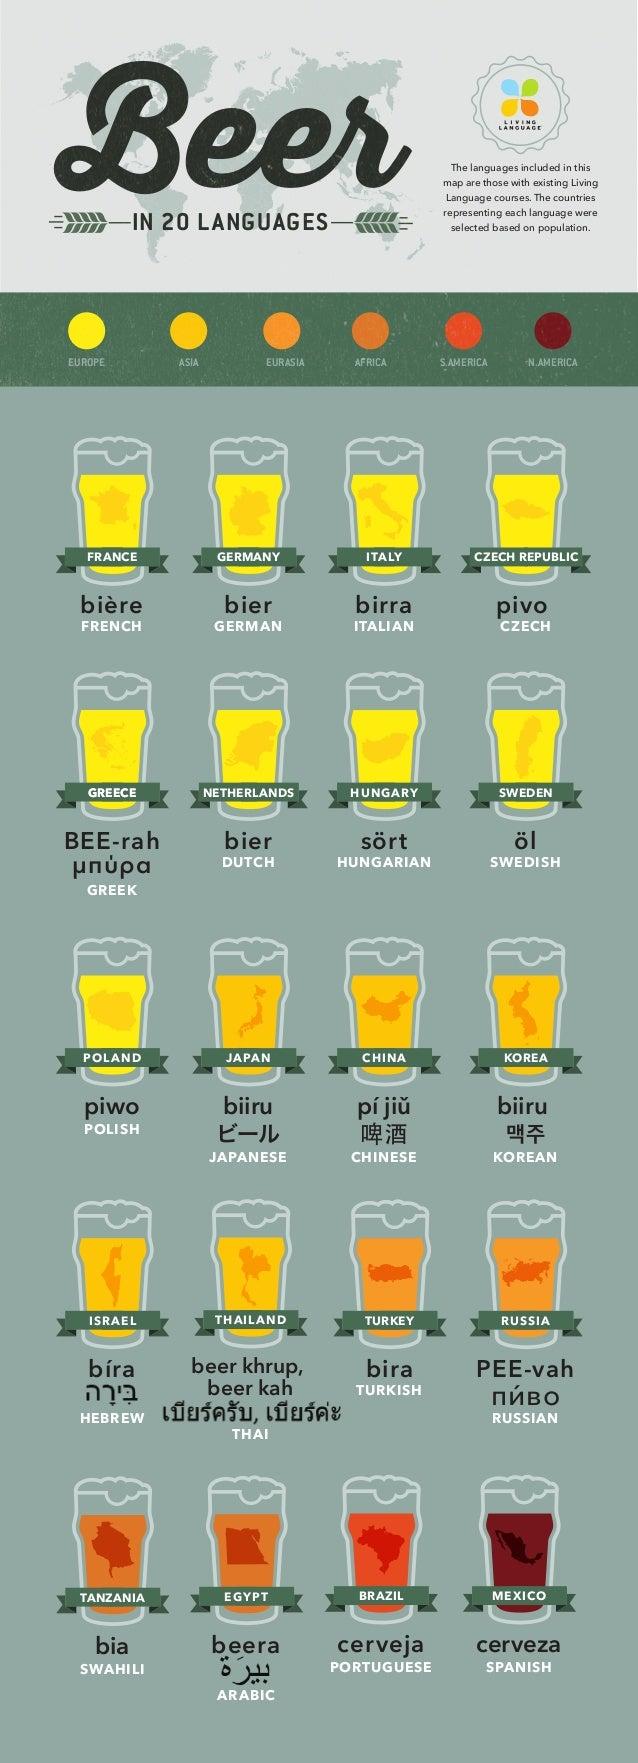 BeerIN 20 LANGUAGES bière FRENCH FRANCE bier GERMAN GERMANY birra ITALIAN ITALY pivo CZECH CZECH REPUBLIC BEE-rah μπύρα GR...